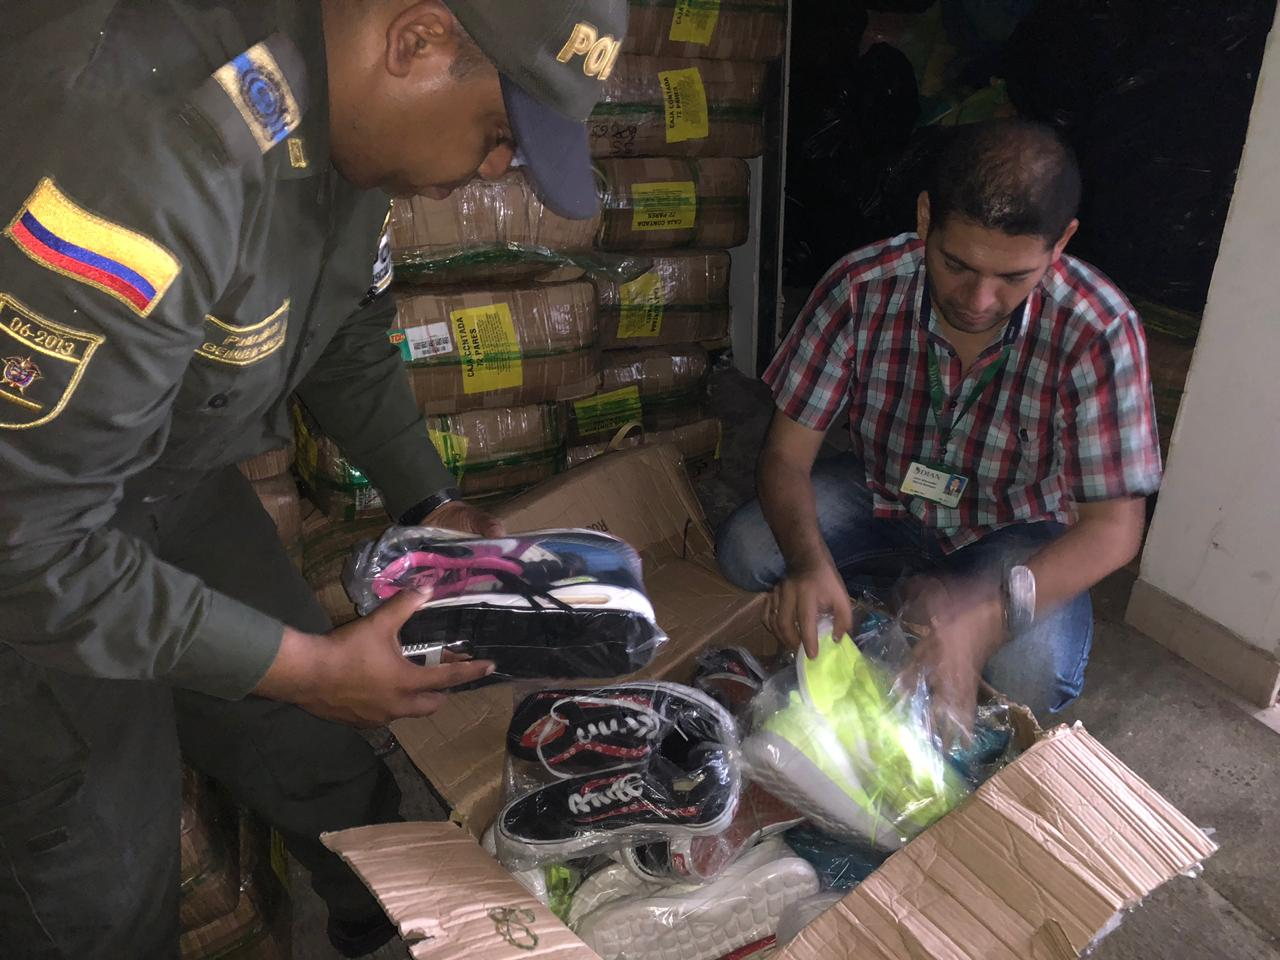 Hallan en bodega de Cali 12 mil pares de calzado de contrabando de origen chino